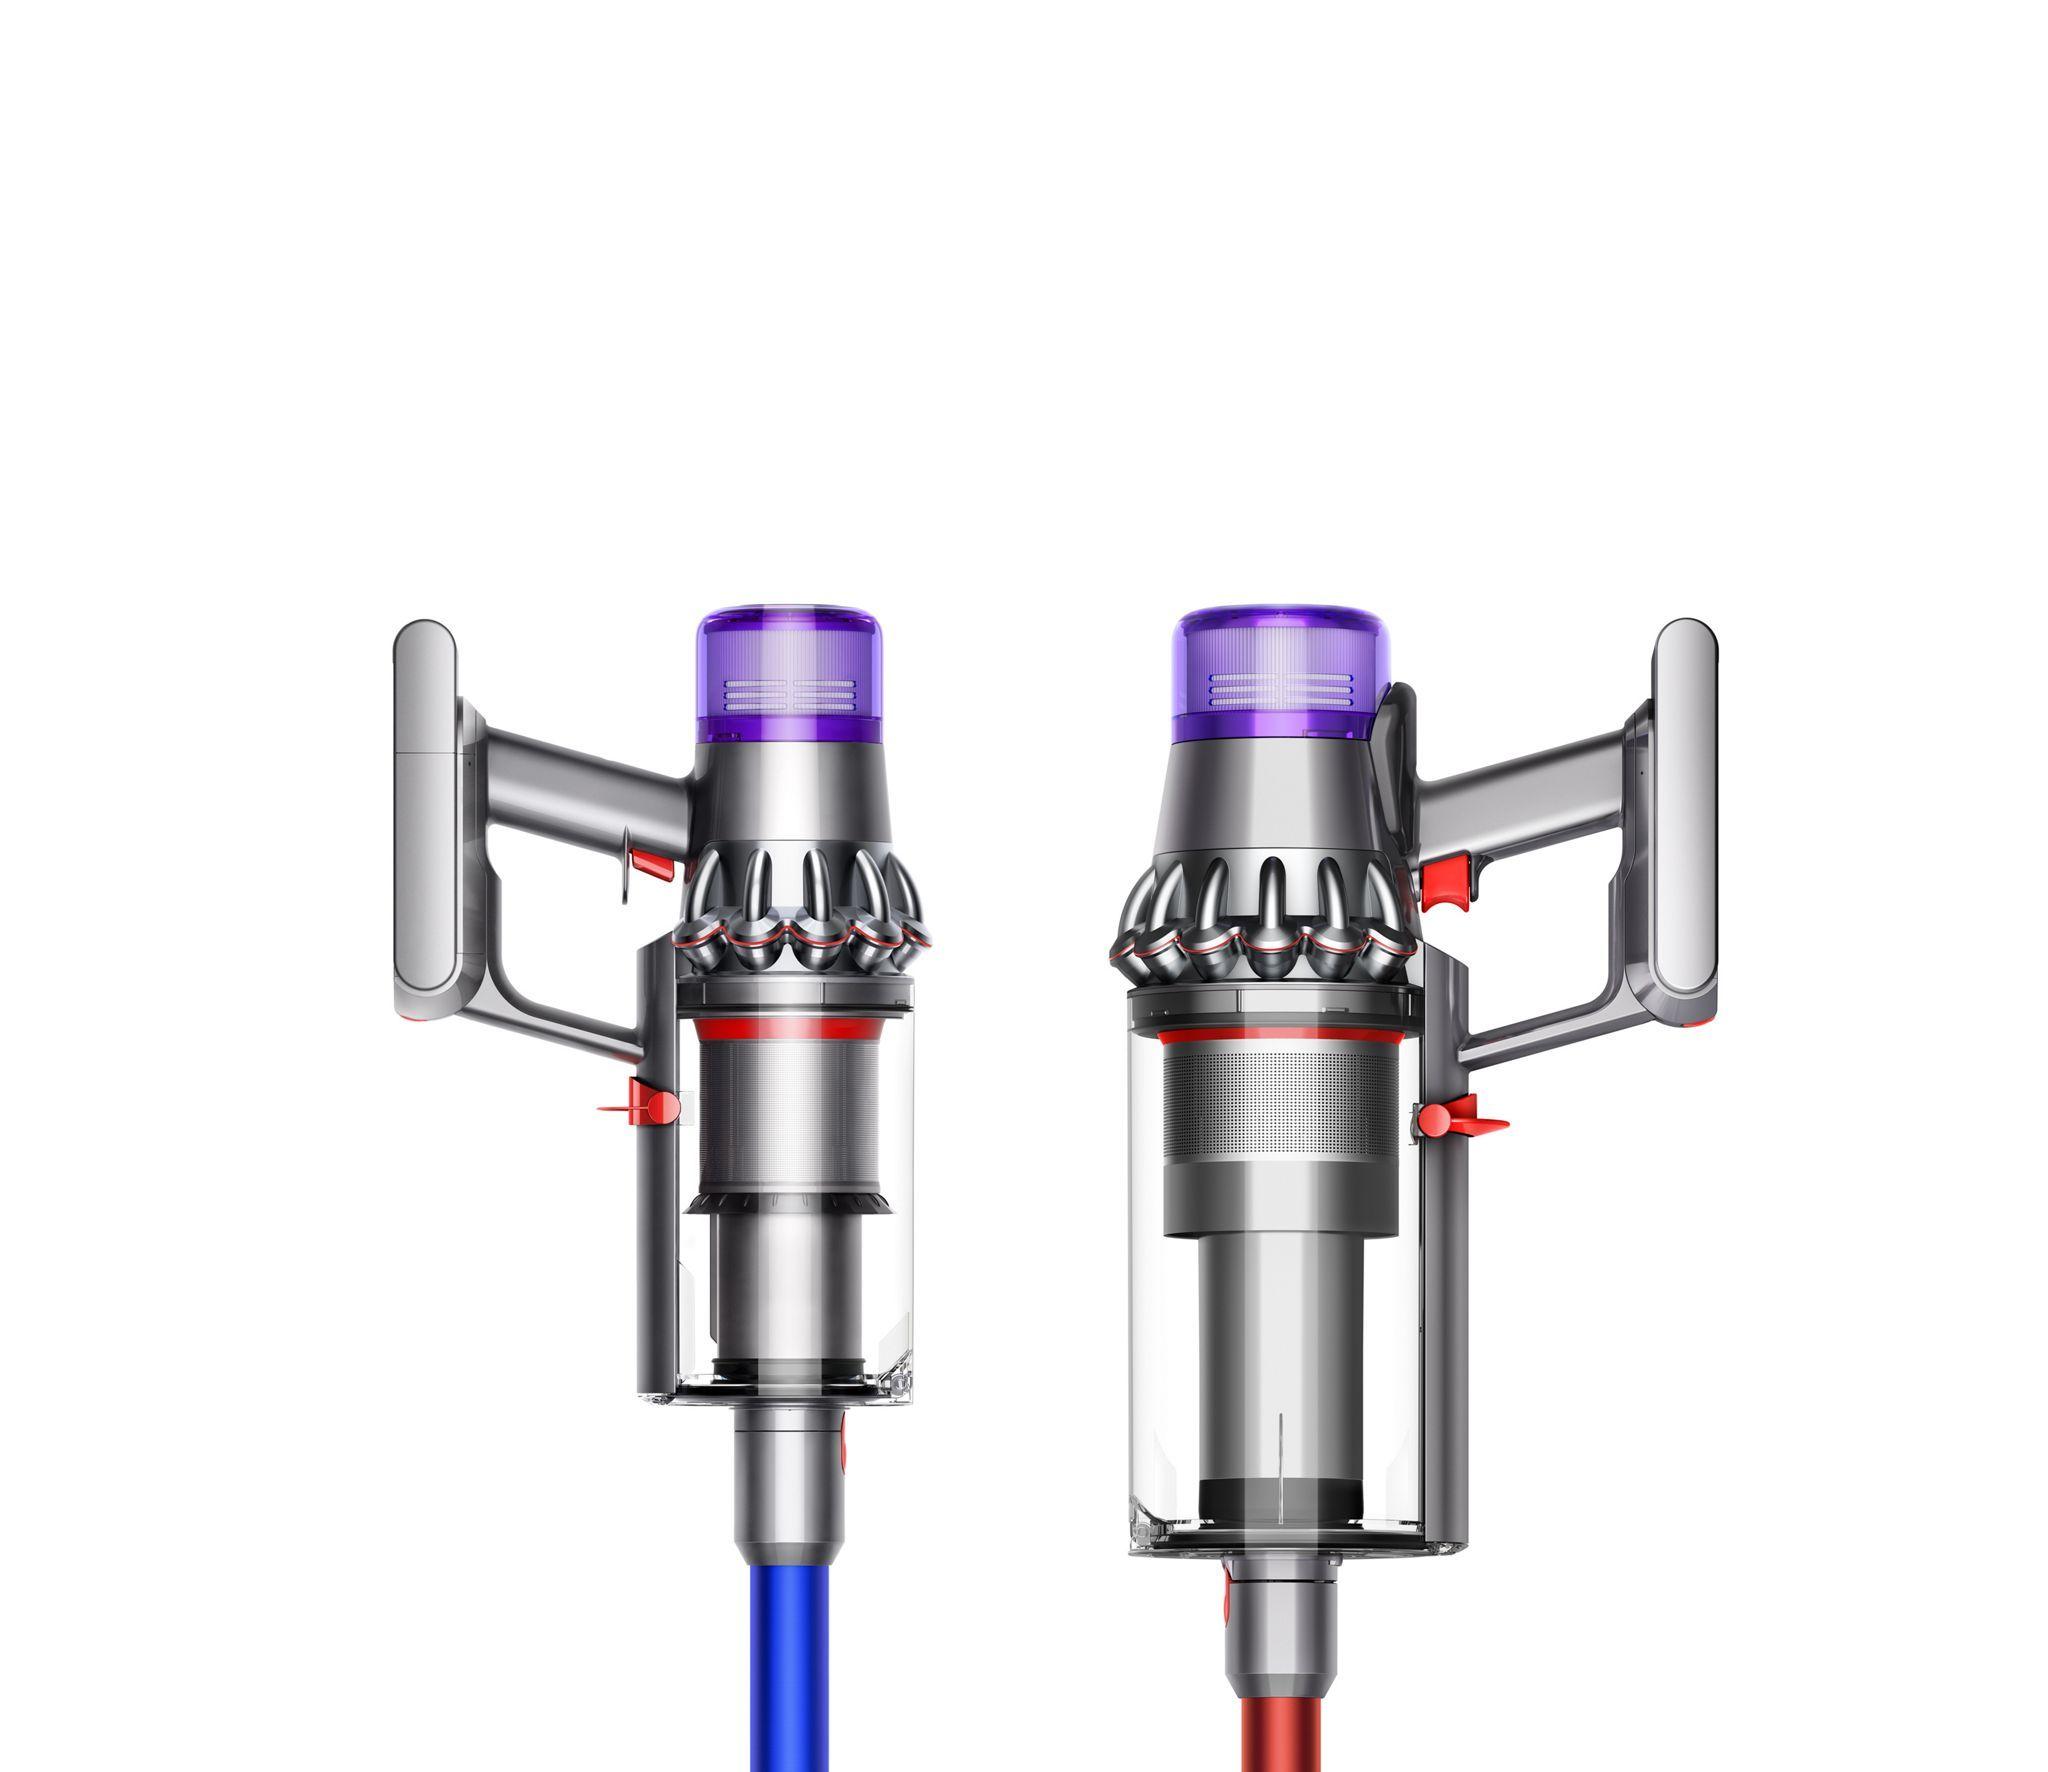 Dyson V8 Animal™ Cordless Vacuum Cleaner Cordless vacuum